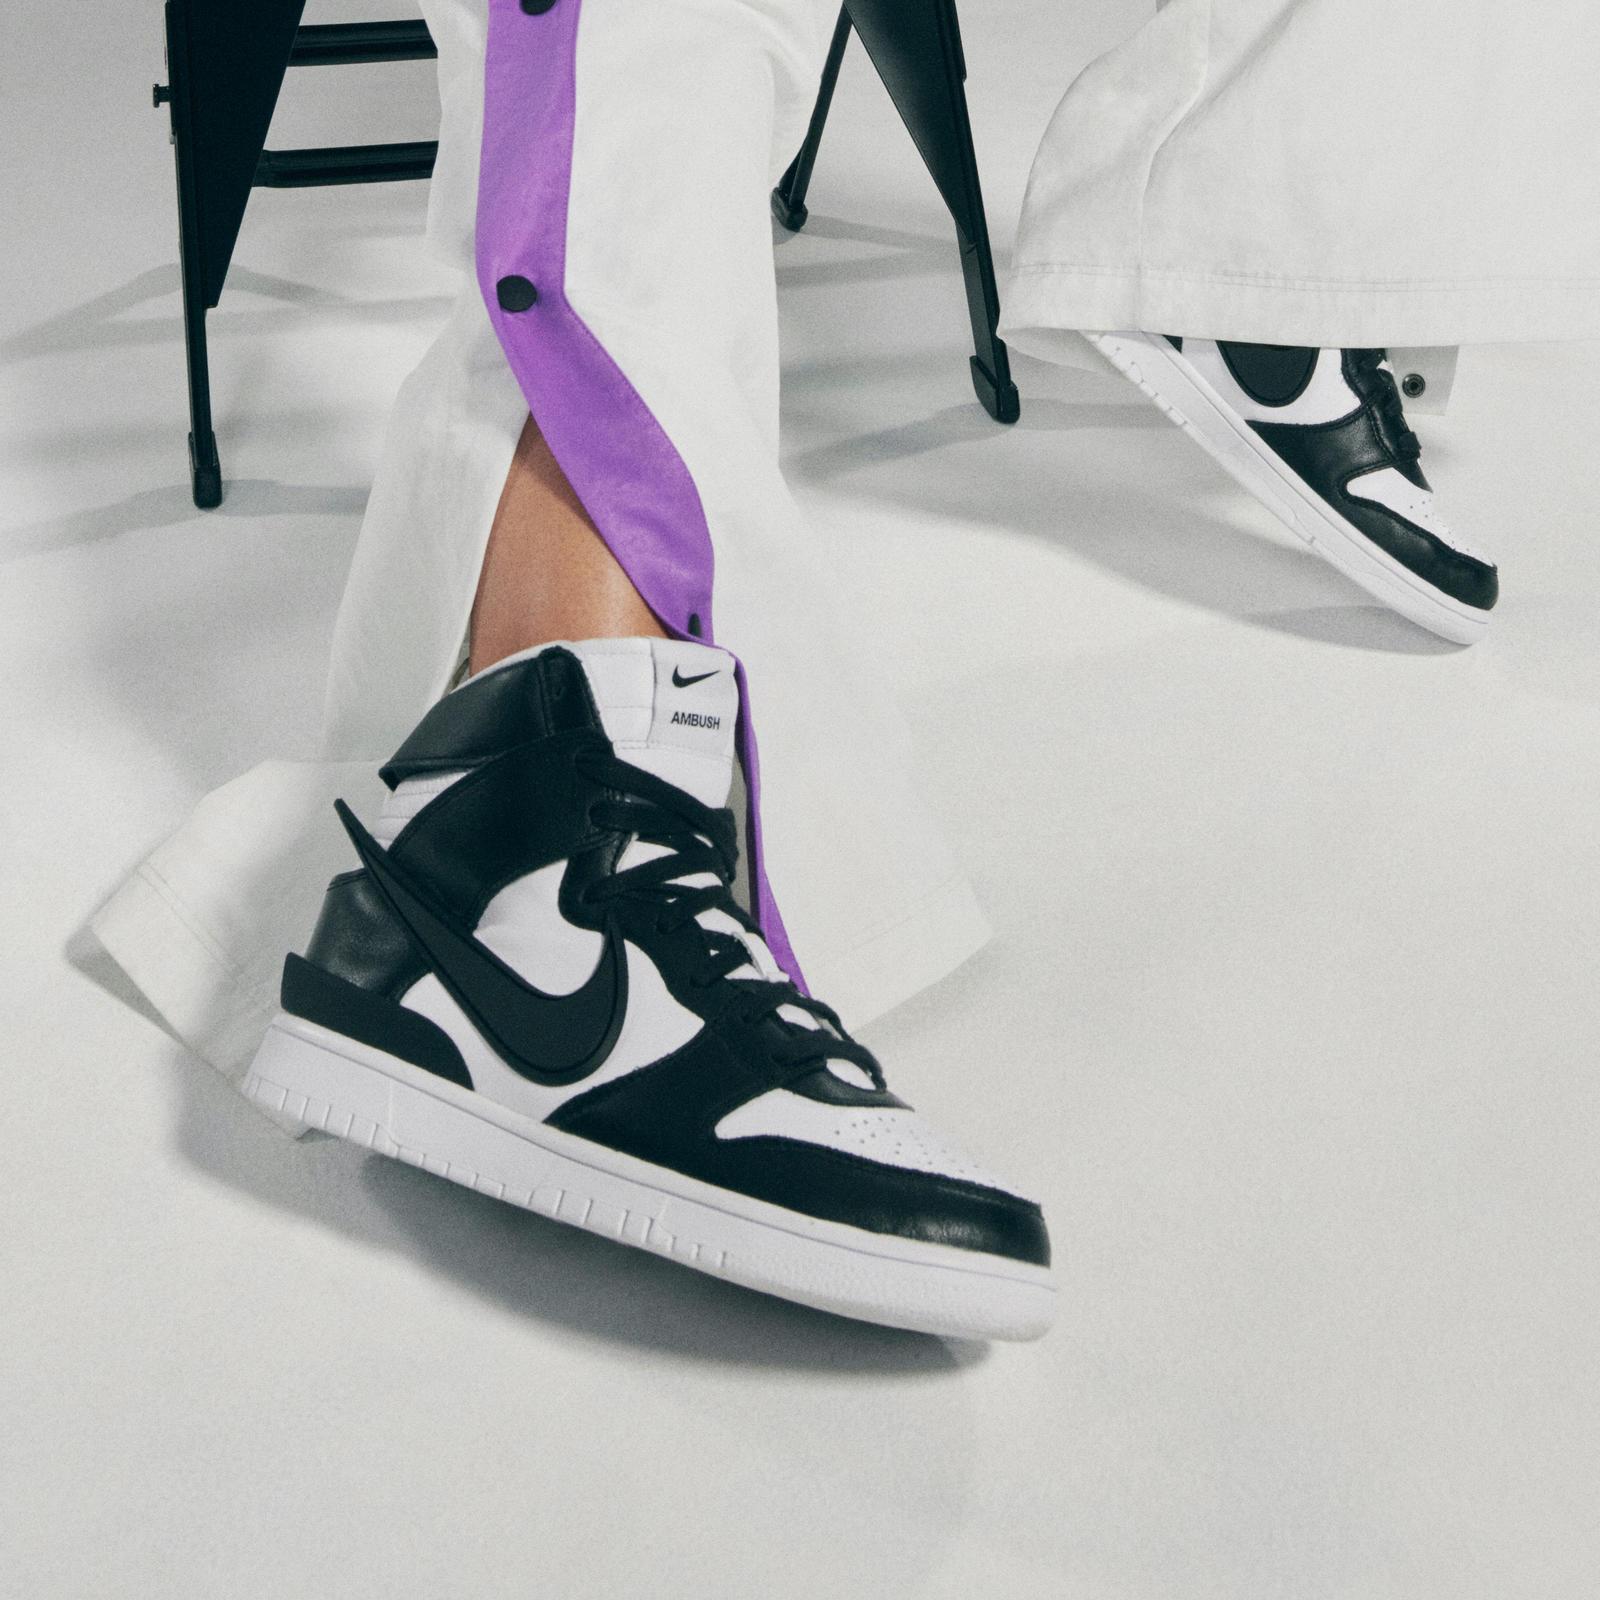 Nike x AMBUSH NBA Apparel Collection